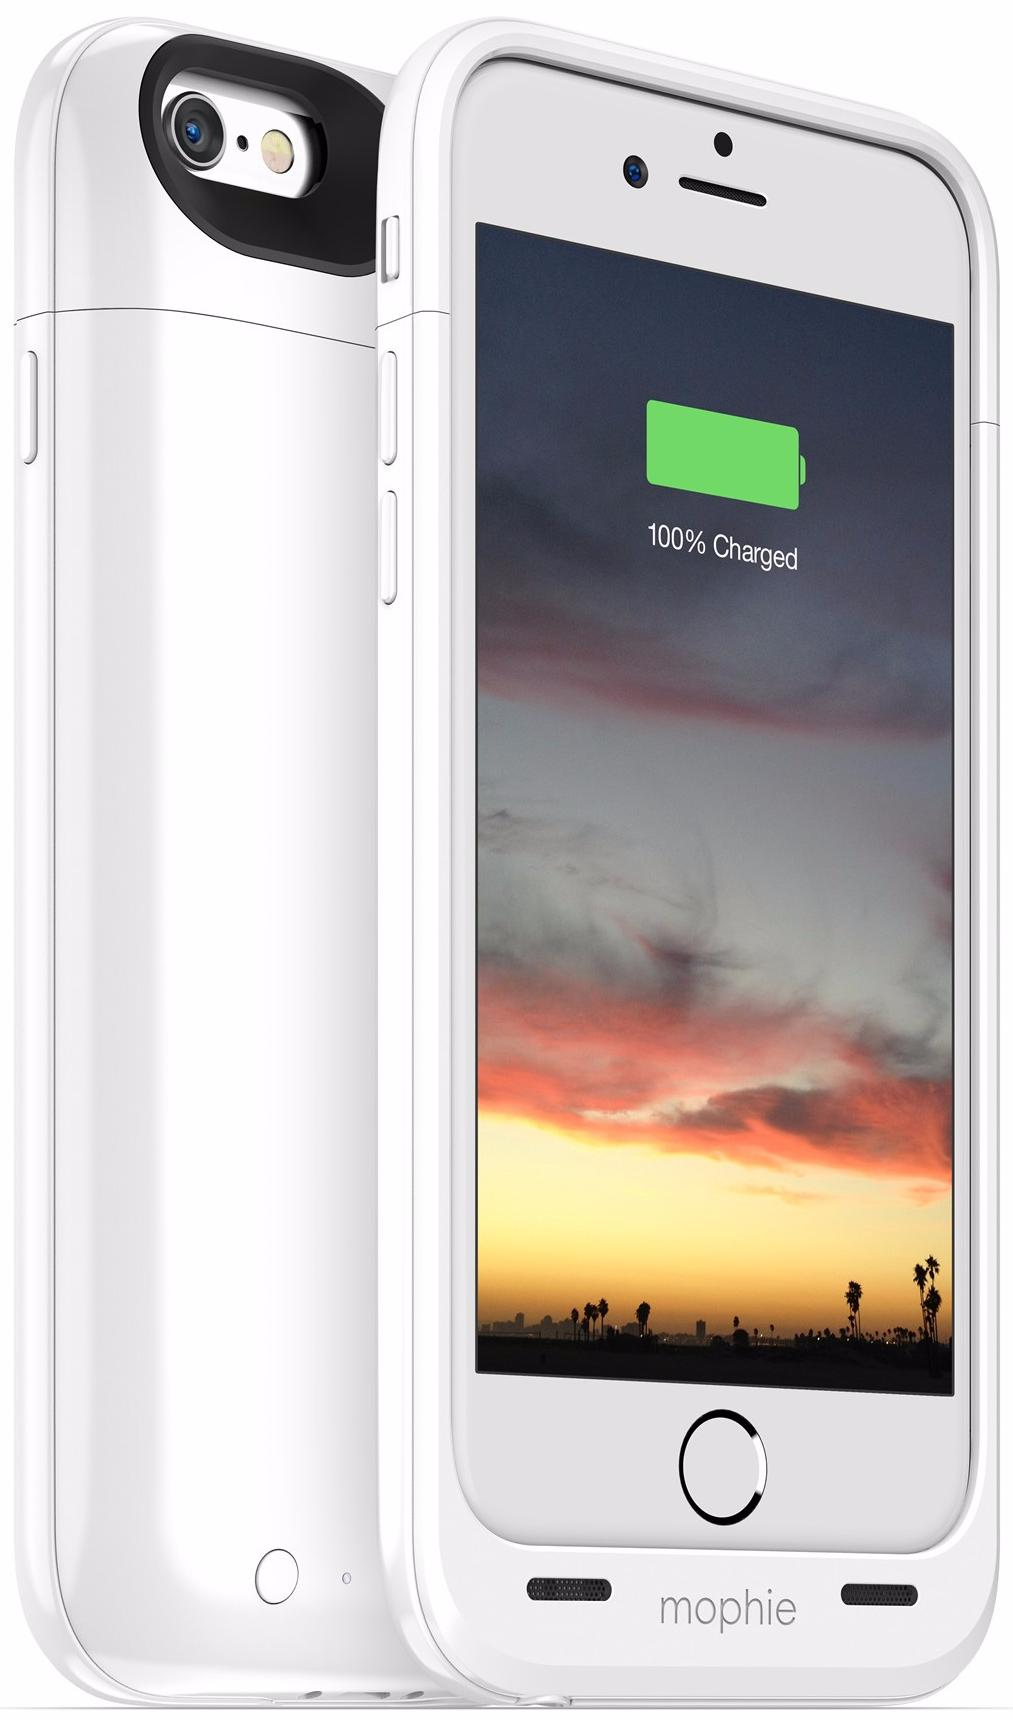 Juice PackЧехлы-аккумуляторы для смартфонов<br>Чехол-аккумулятор<br>